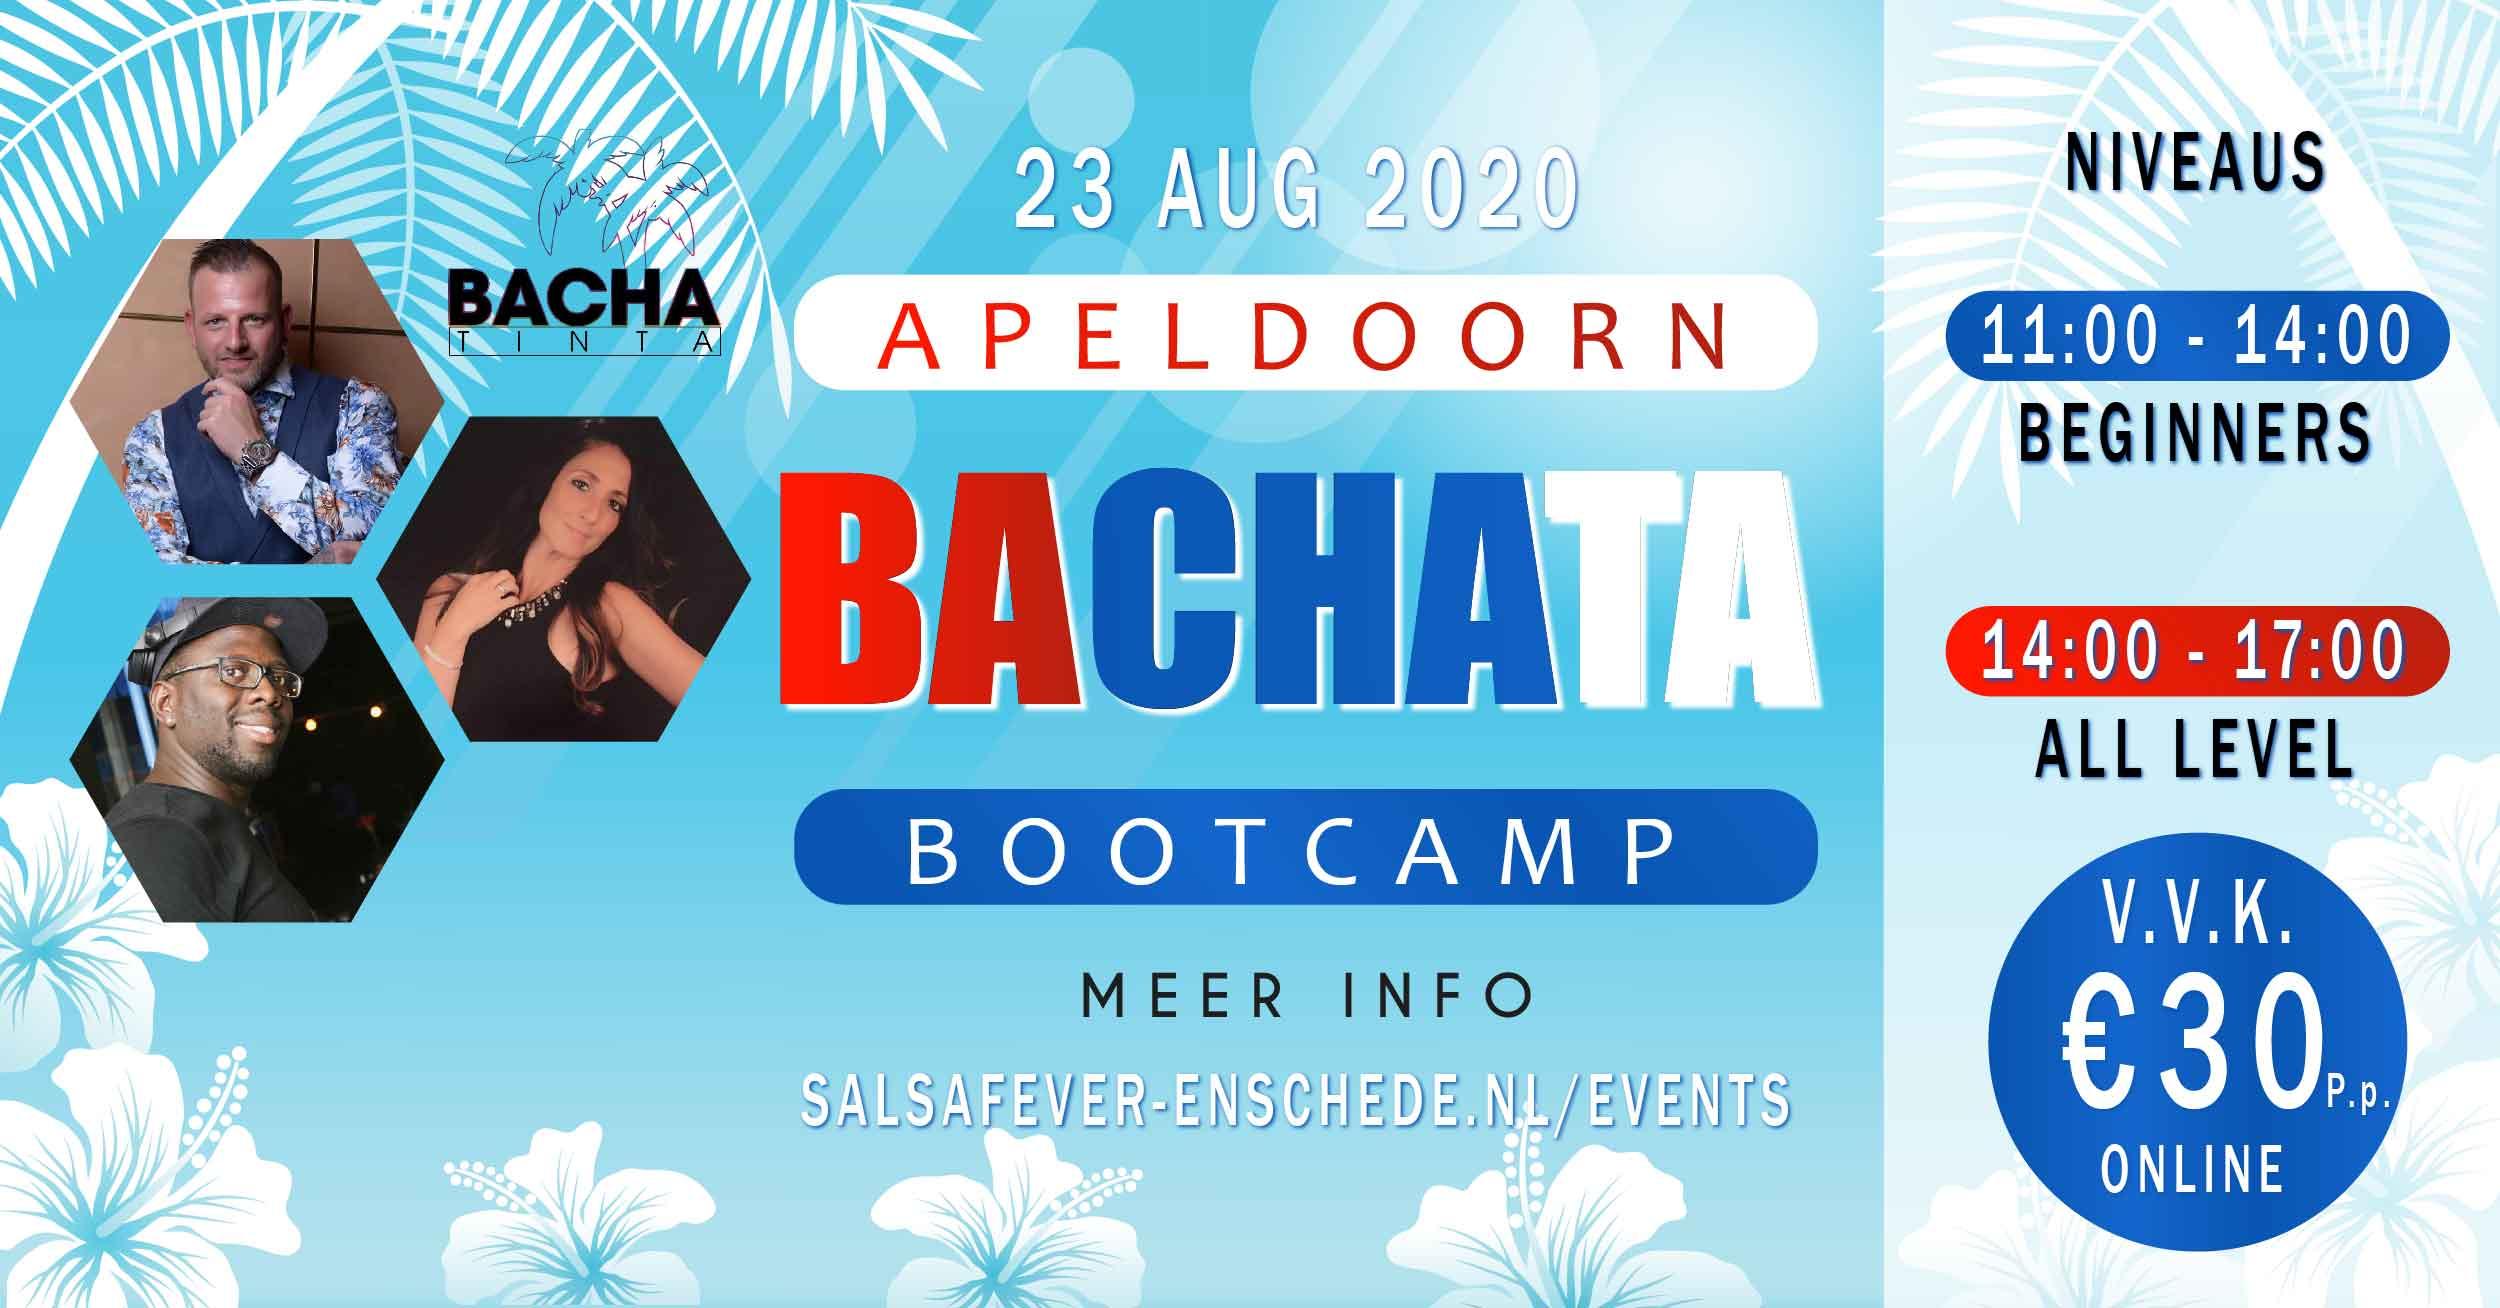 apledoorn bachata bootcamp bachatinta-01